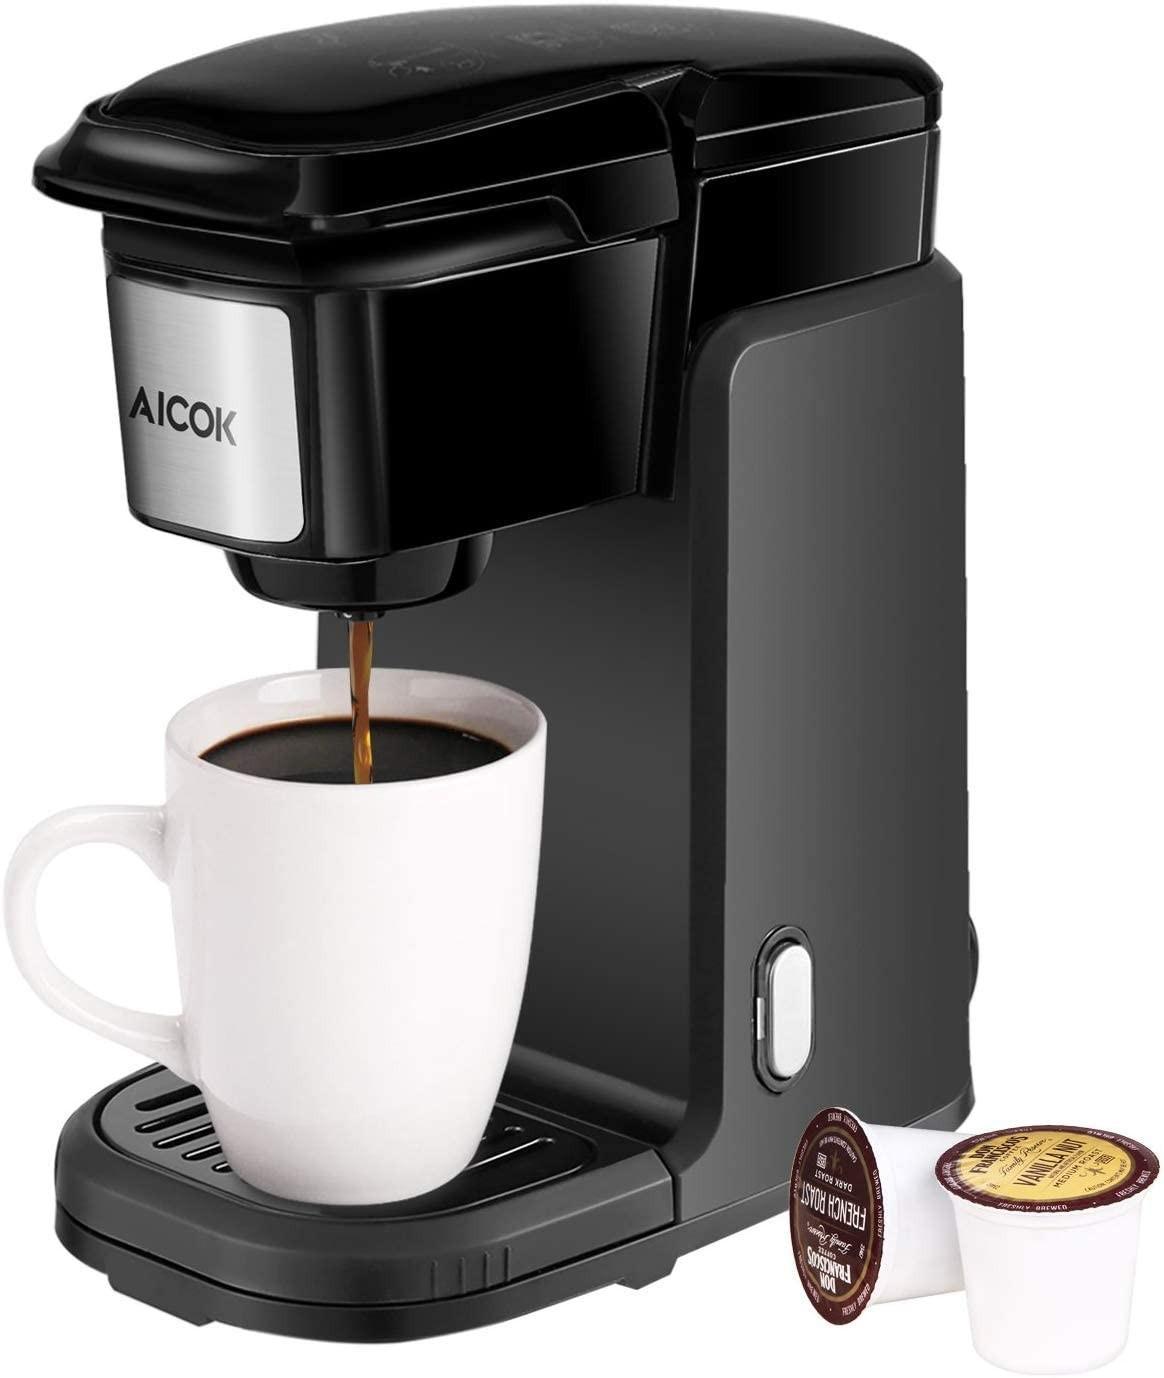 Single Serve Coffee Maker, AICOK Single Cup Coffee Maker, 800W Single Serve Coffee Brewer For K Cup